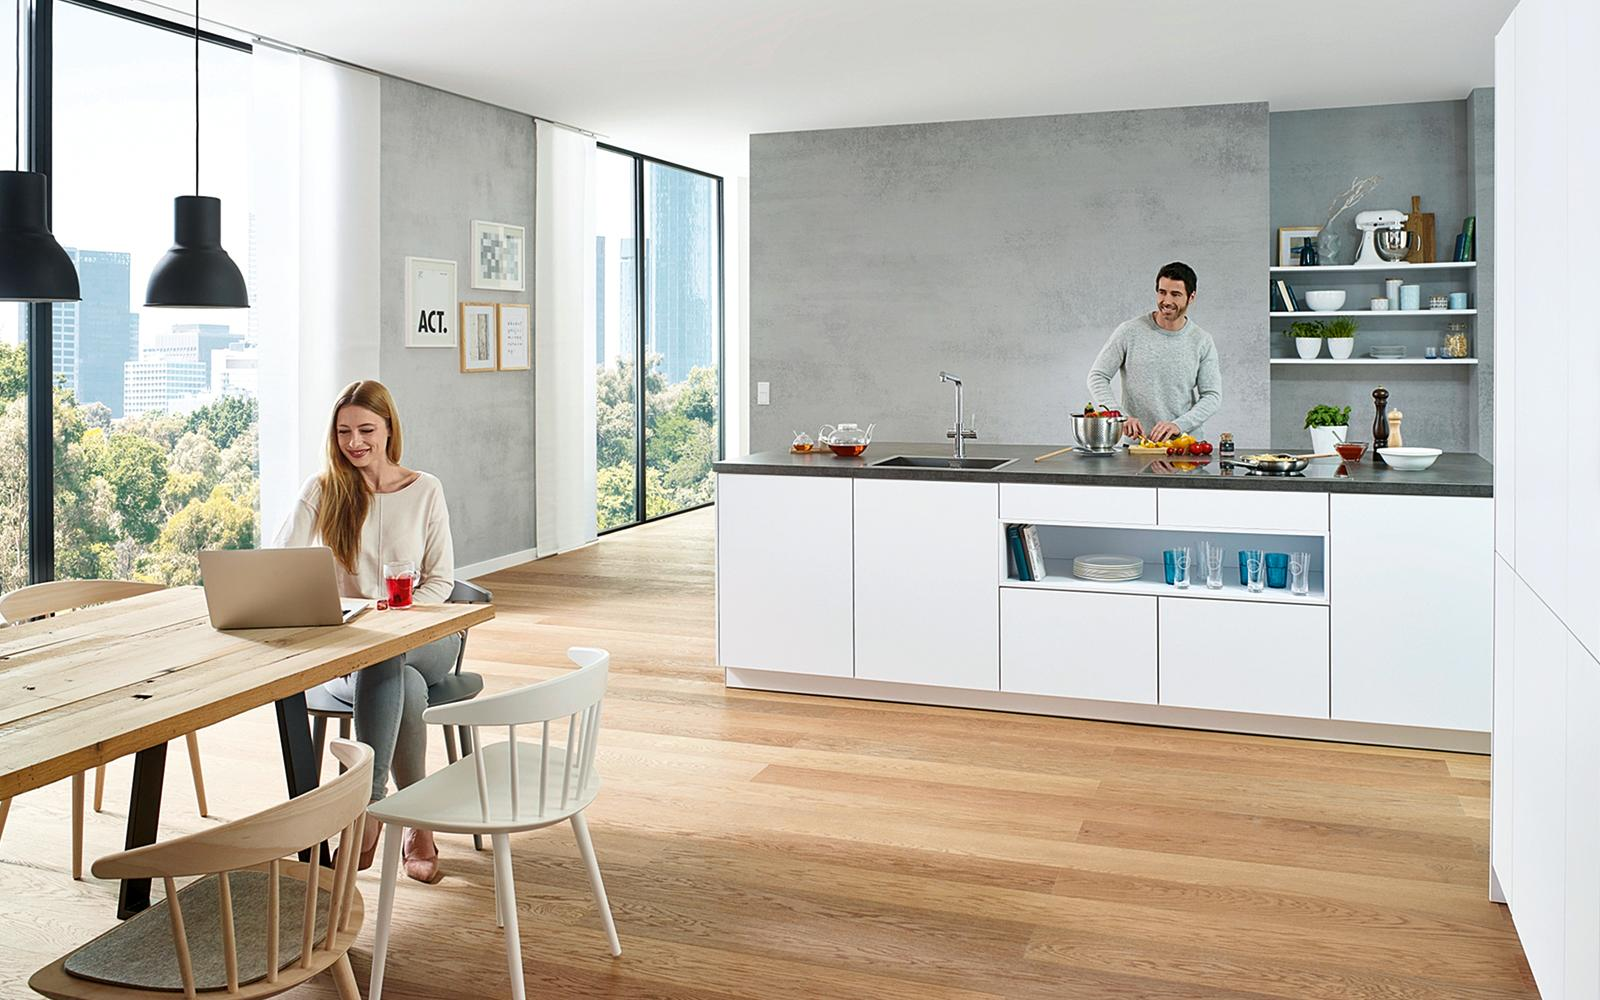 Kuchenarmatur Grohe Red Schimmel Hof Oberfranken